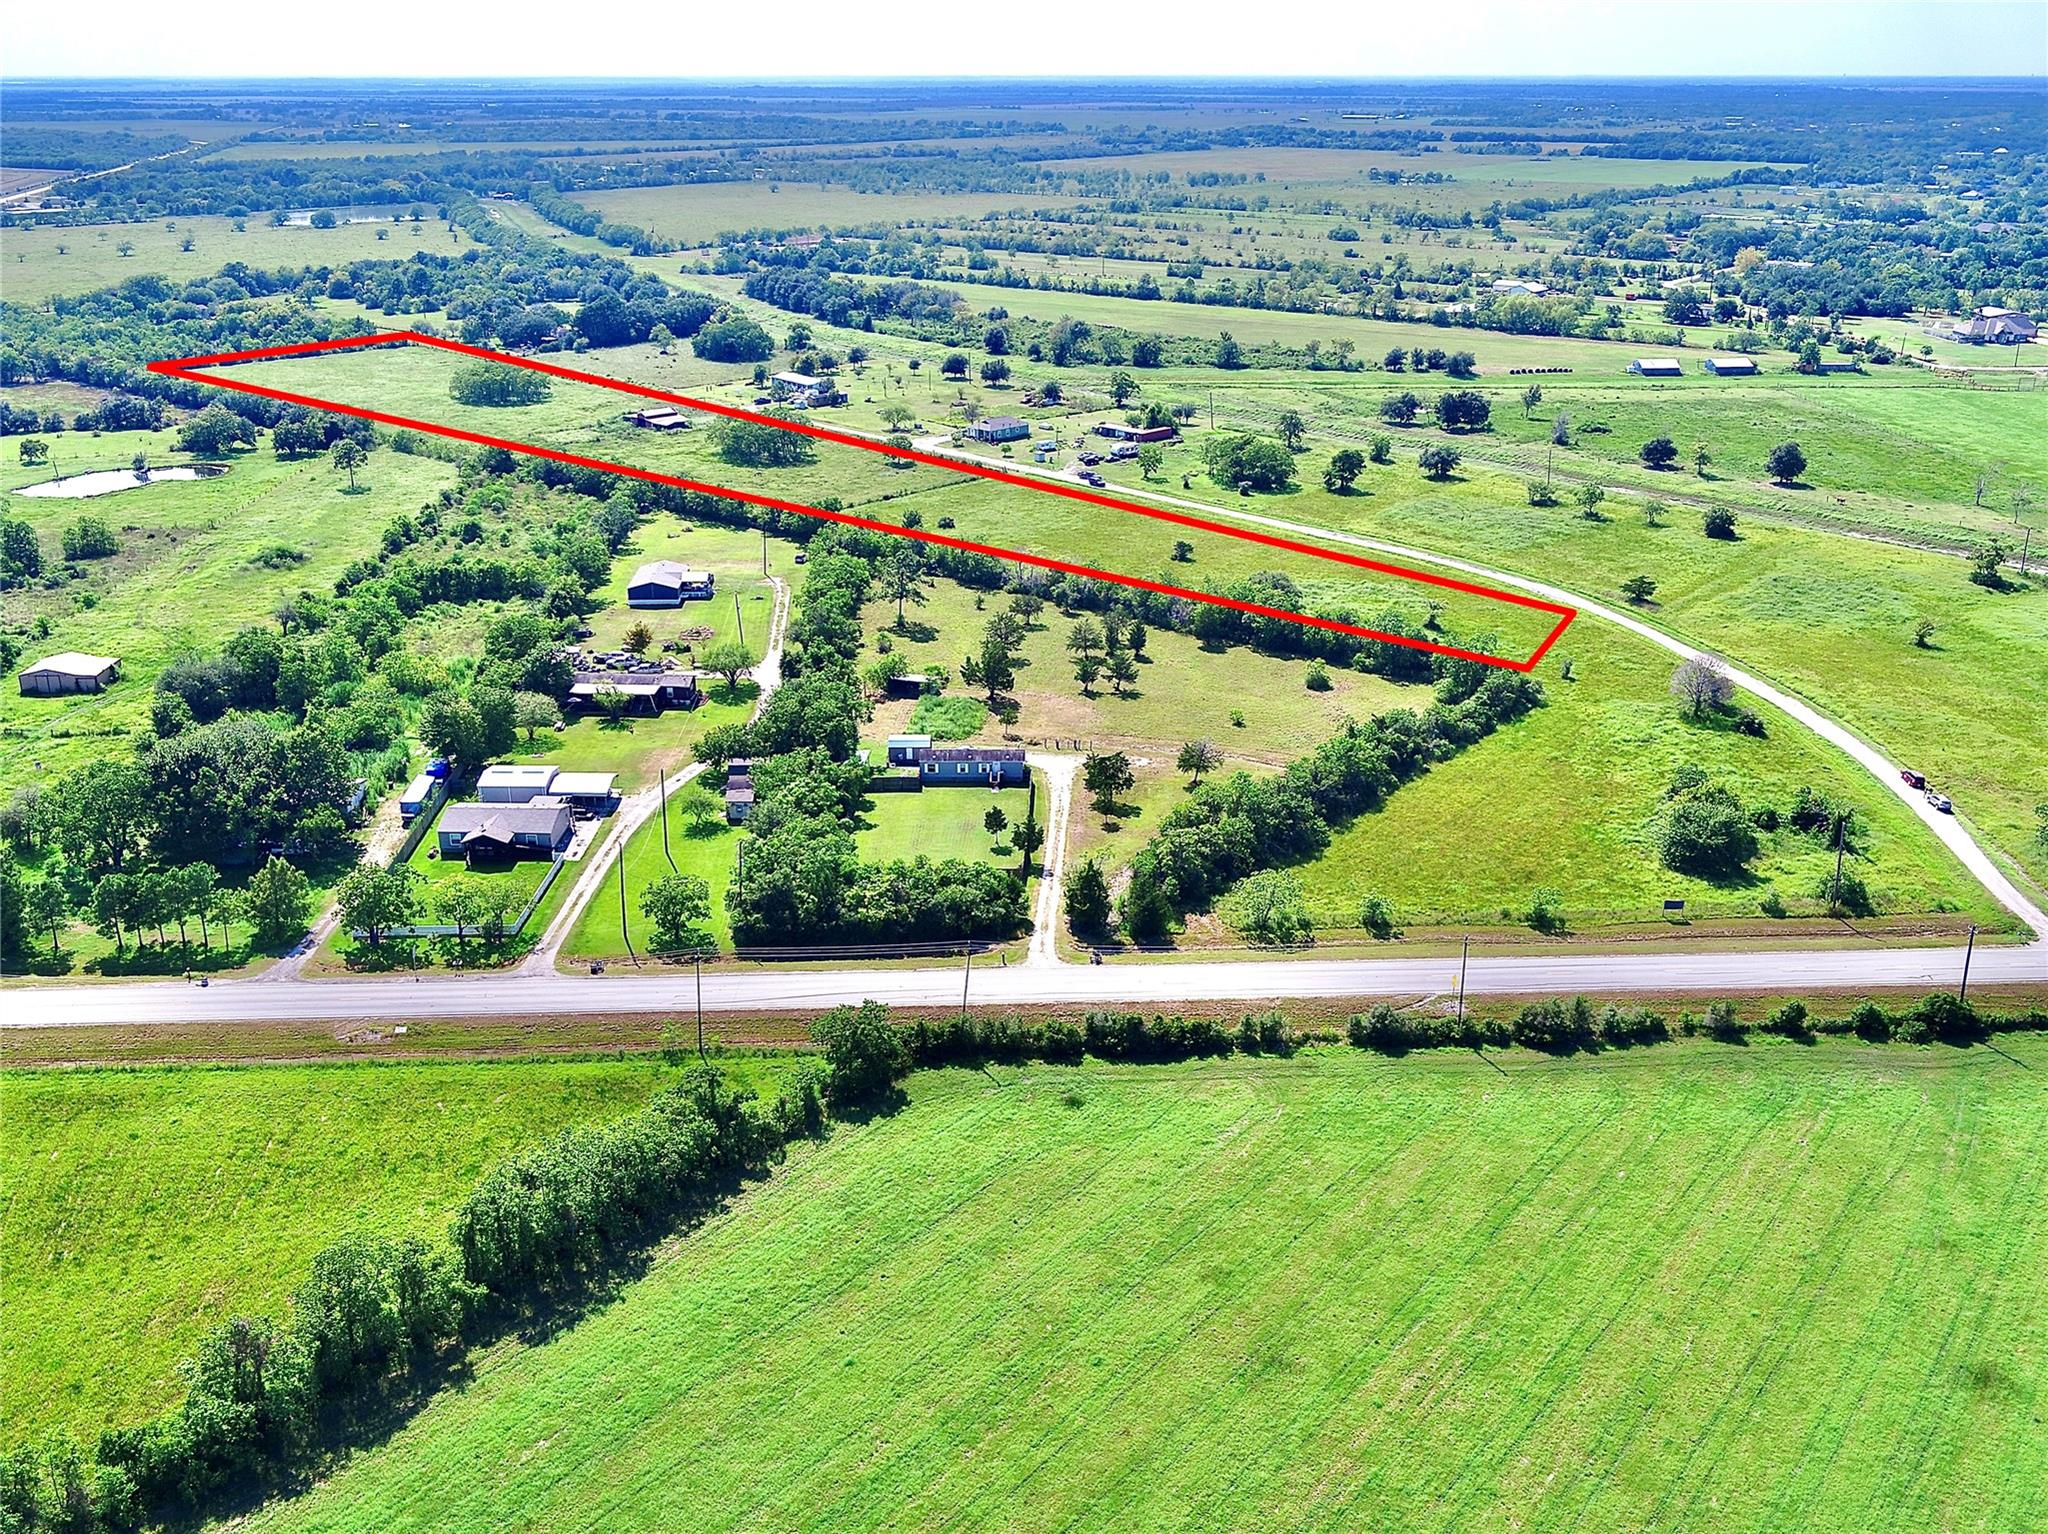 0000 FM 646 RD S Property Photo - Santa Fe, TX real estate listing